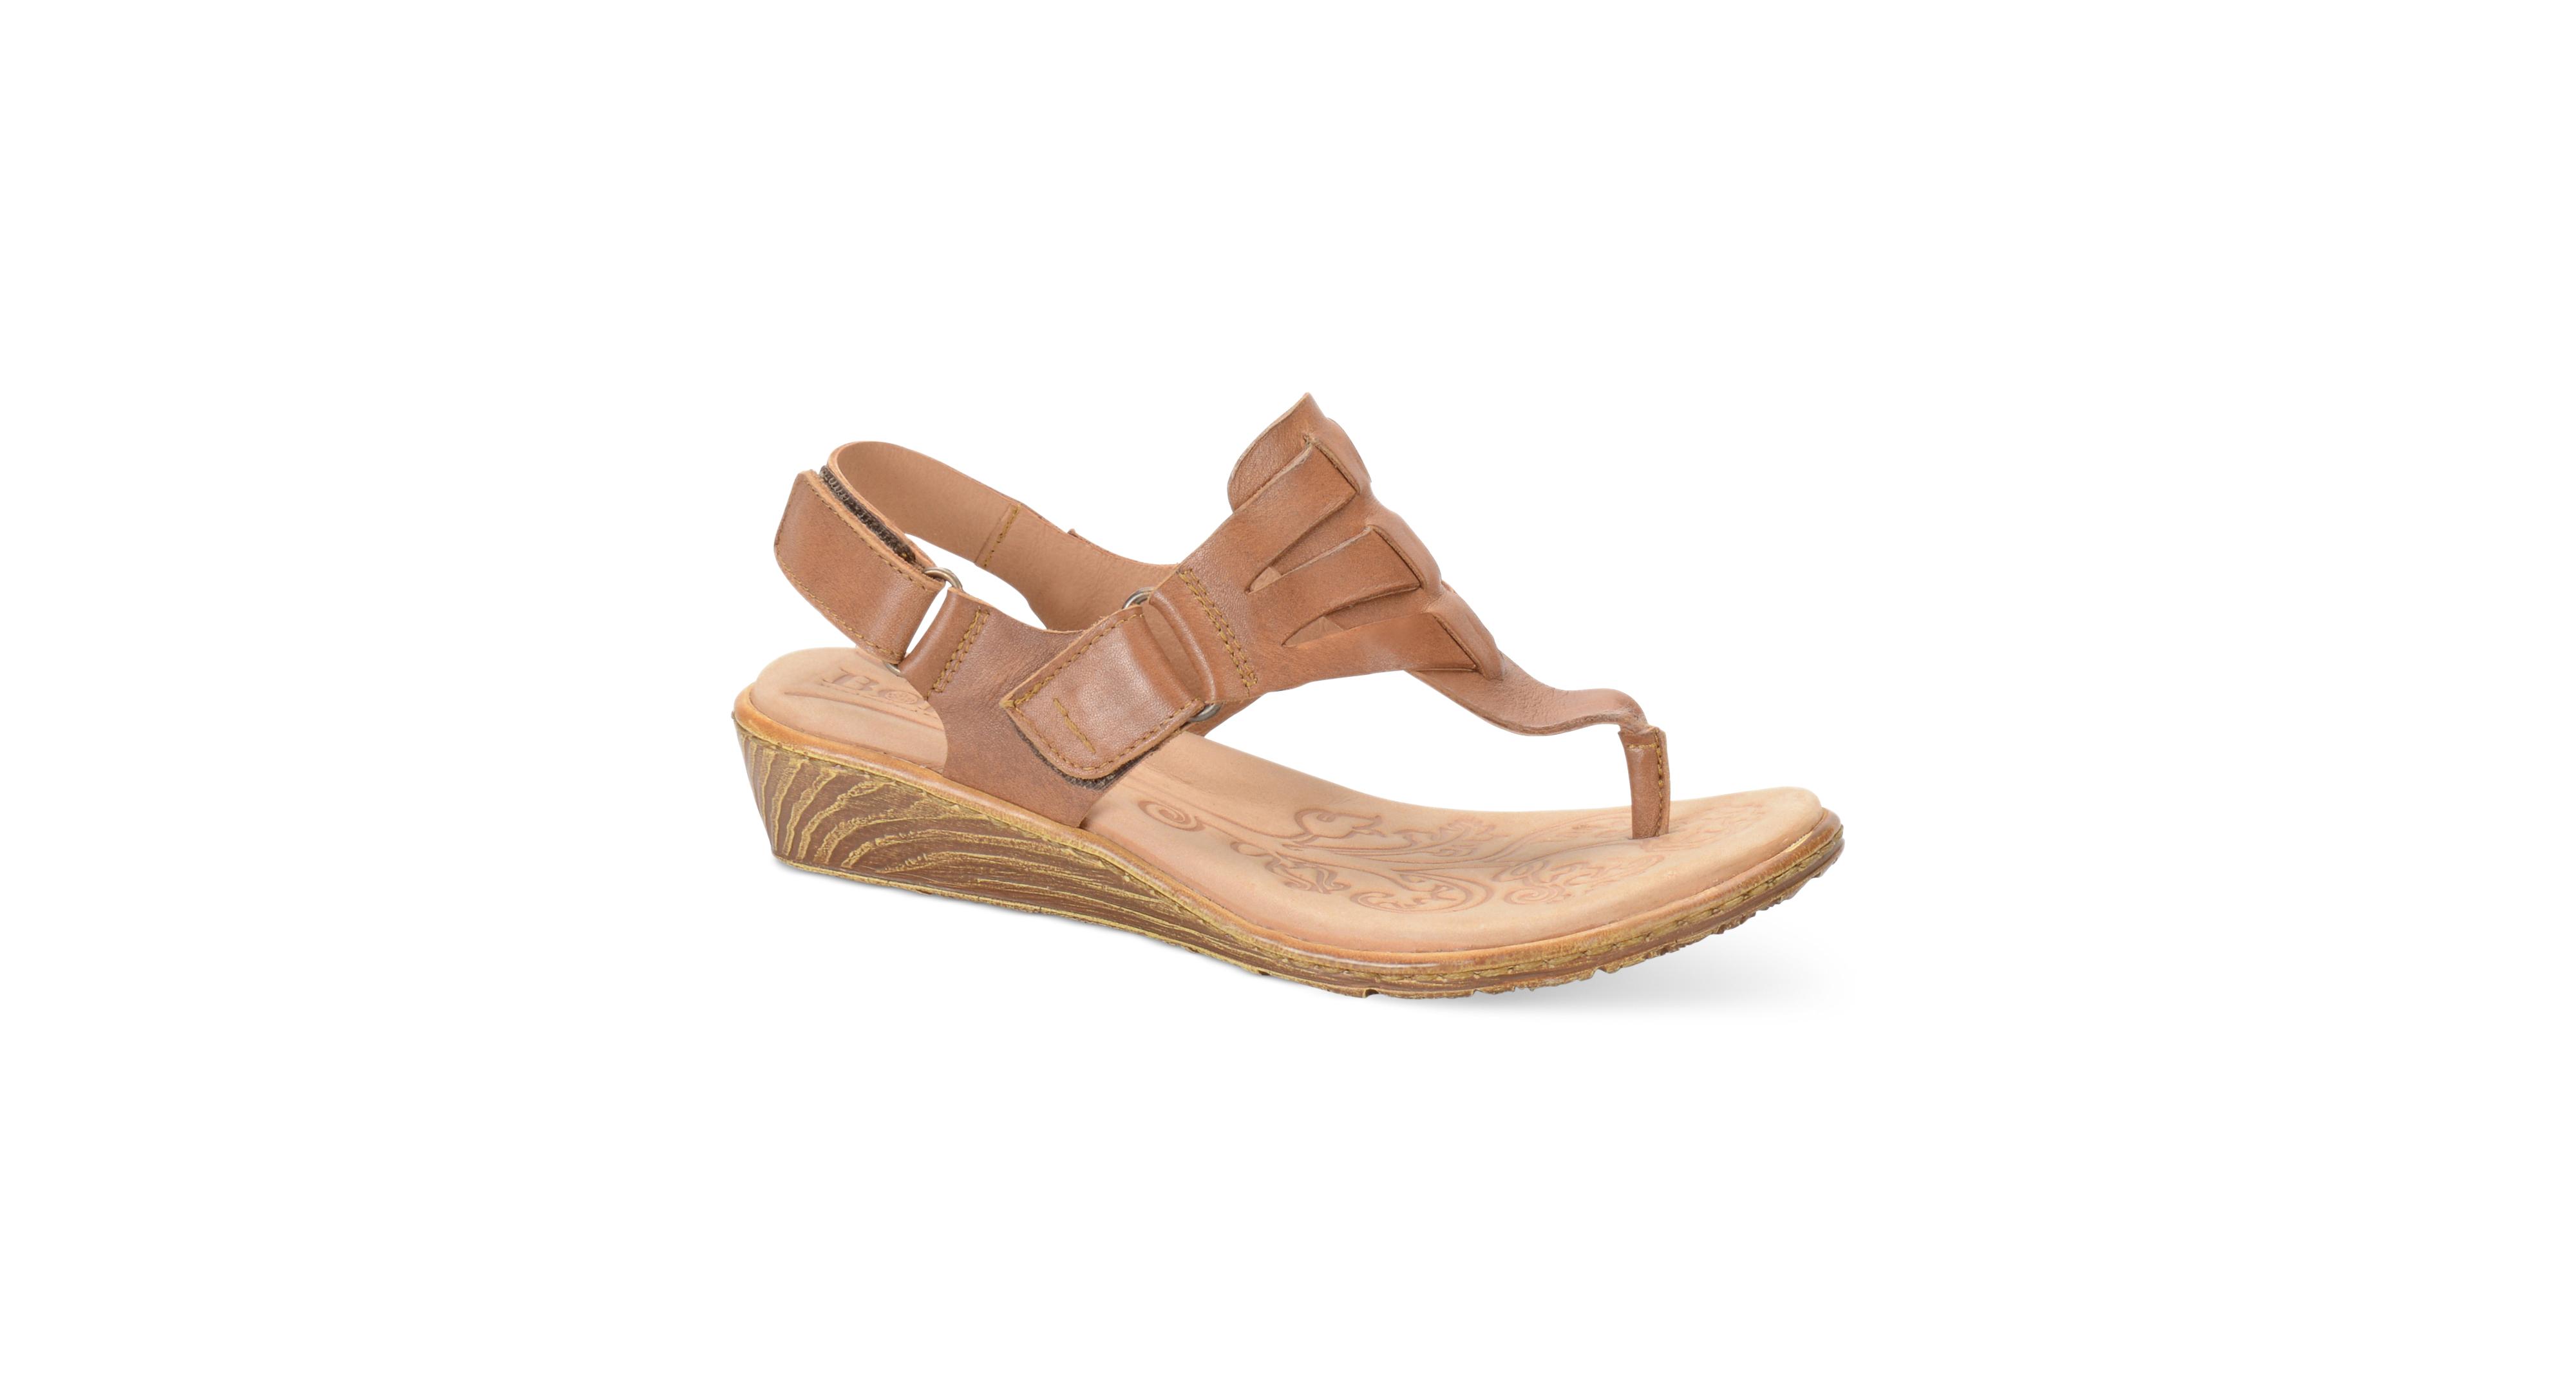 024c88496d4b Born Karis Wedge Thong Sandals